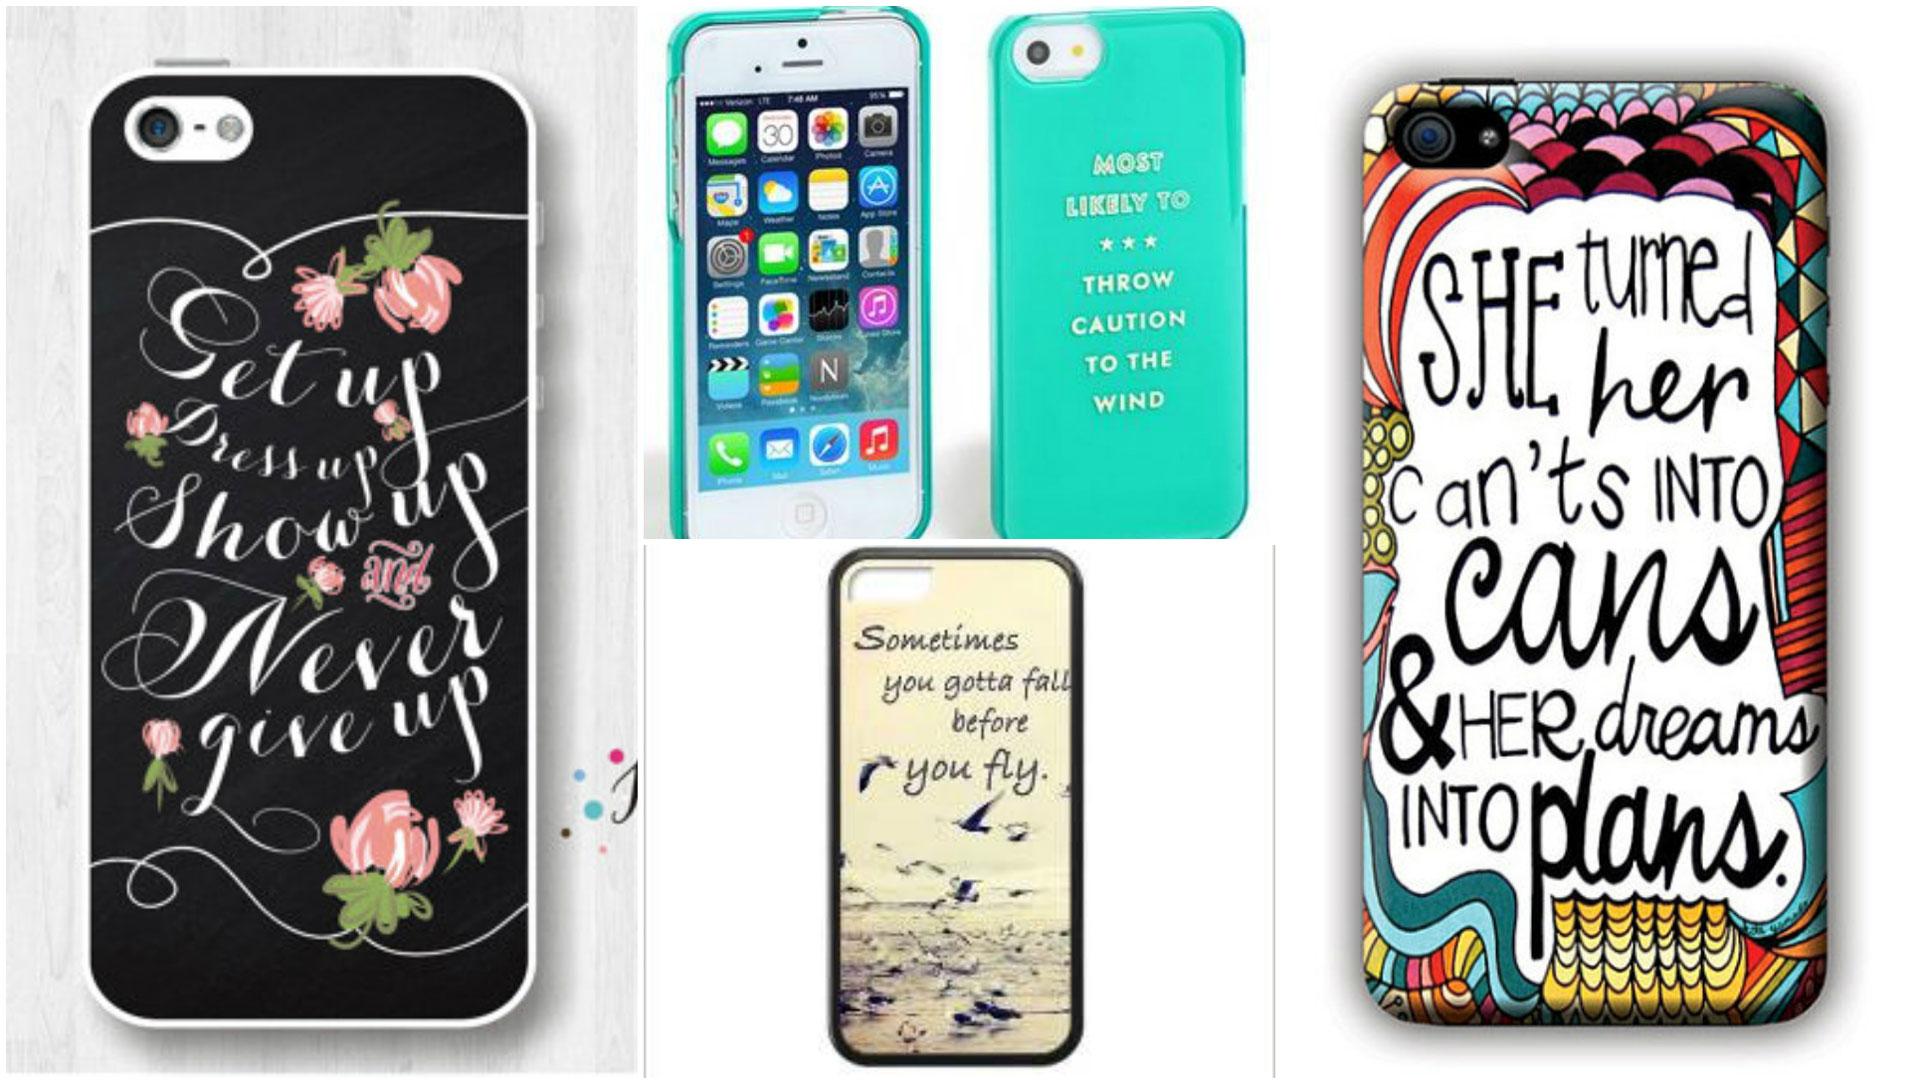 Phone case collage